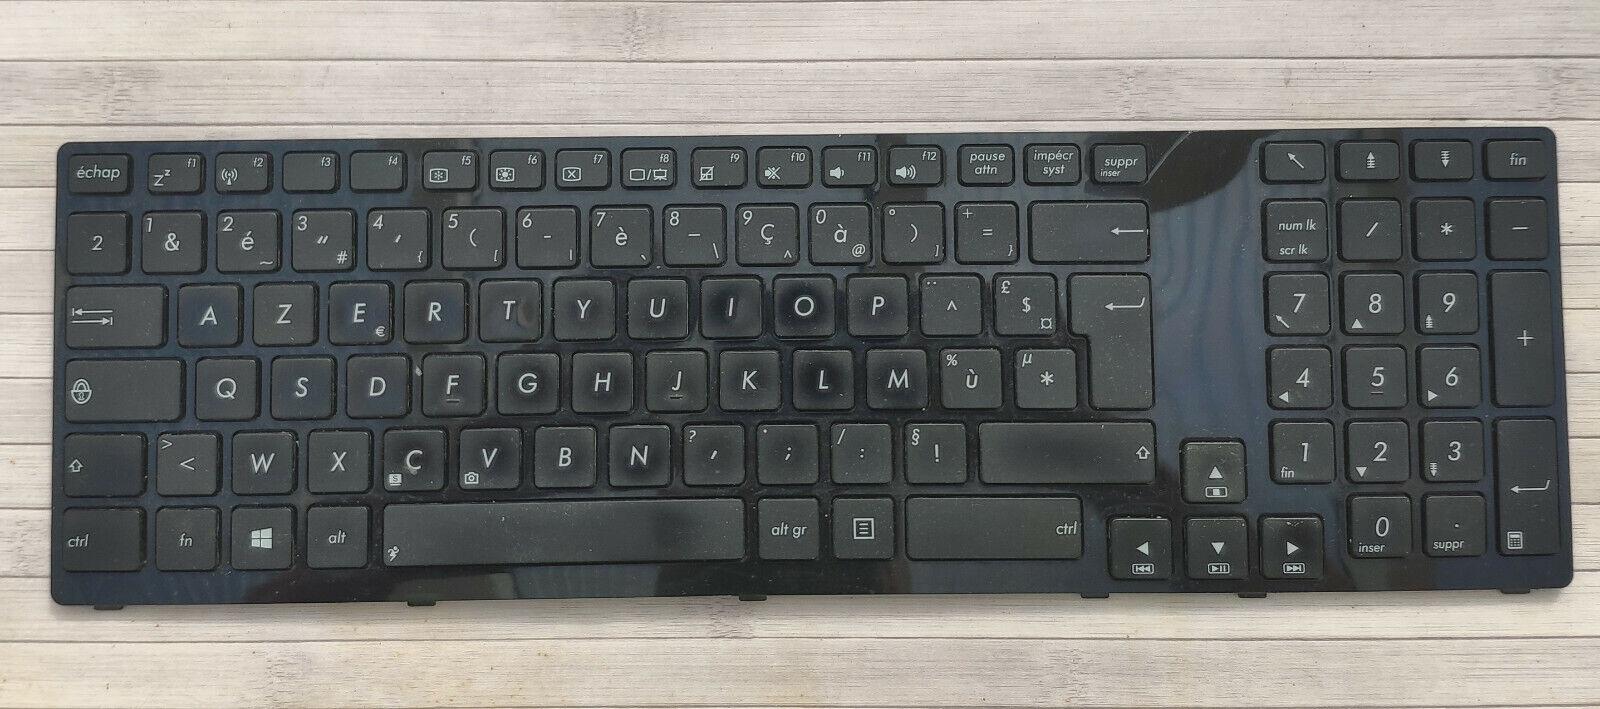 originale clavier asus r900v r900vb-yz063h - v126202ak2   keyboard serie r900